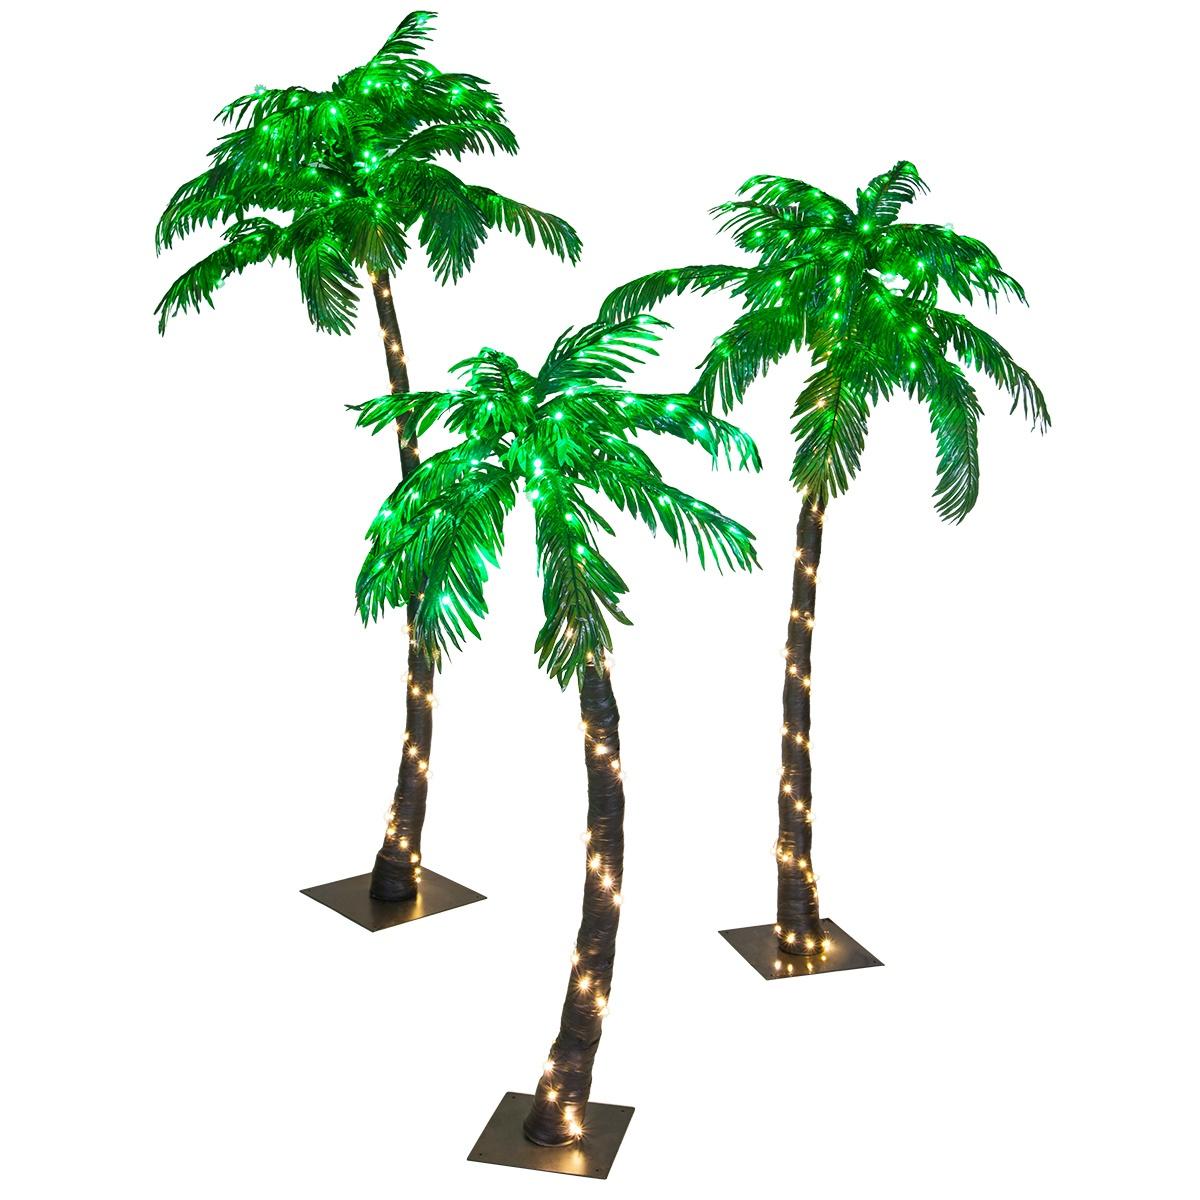 Christmas Lights Palm Trees: LED Curved Lighted Palm Tree